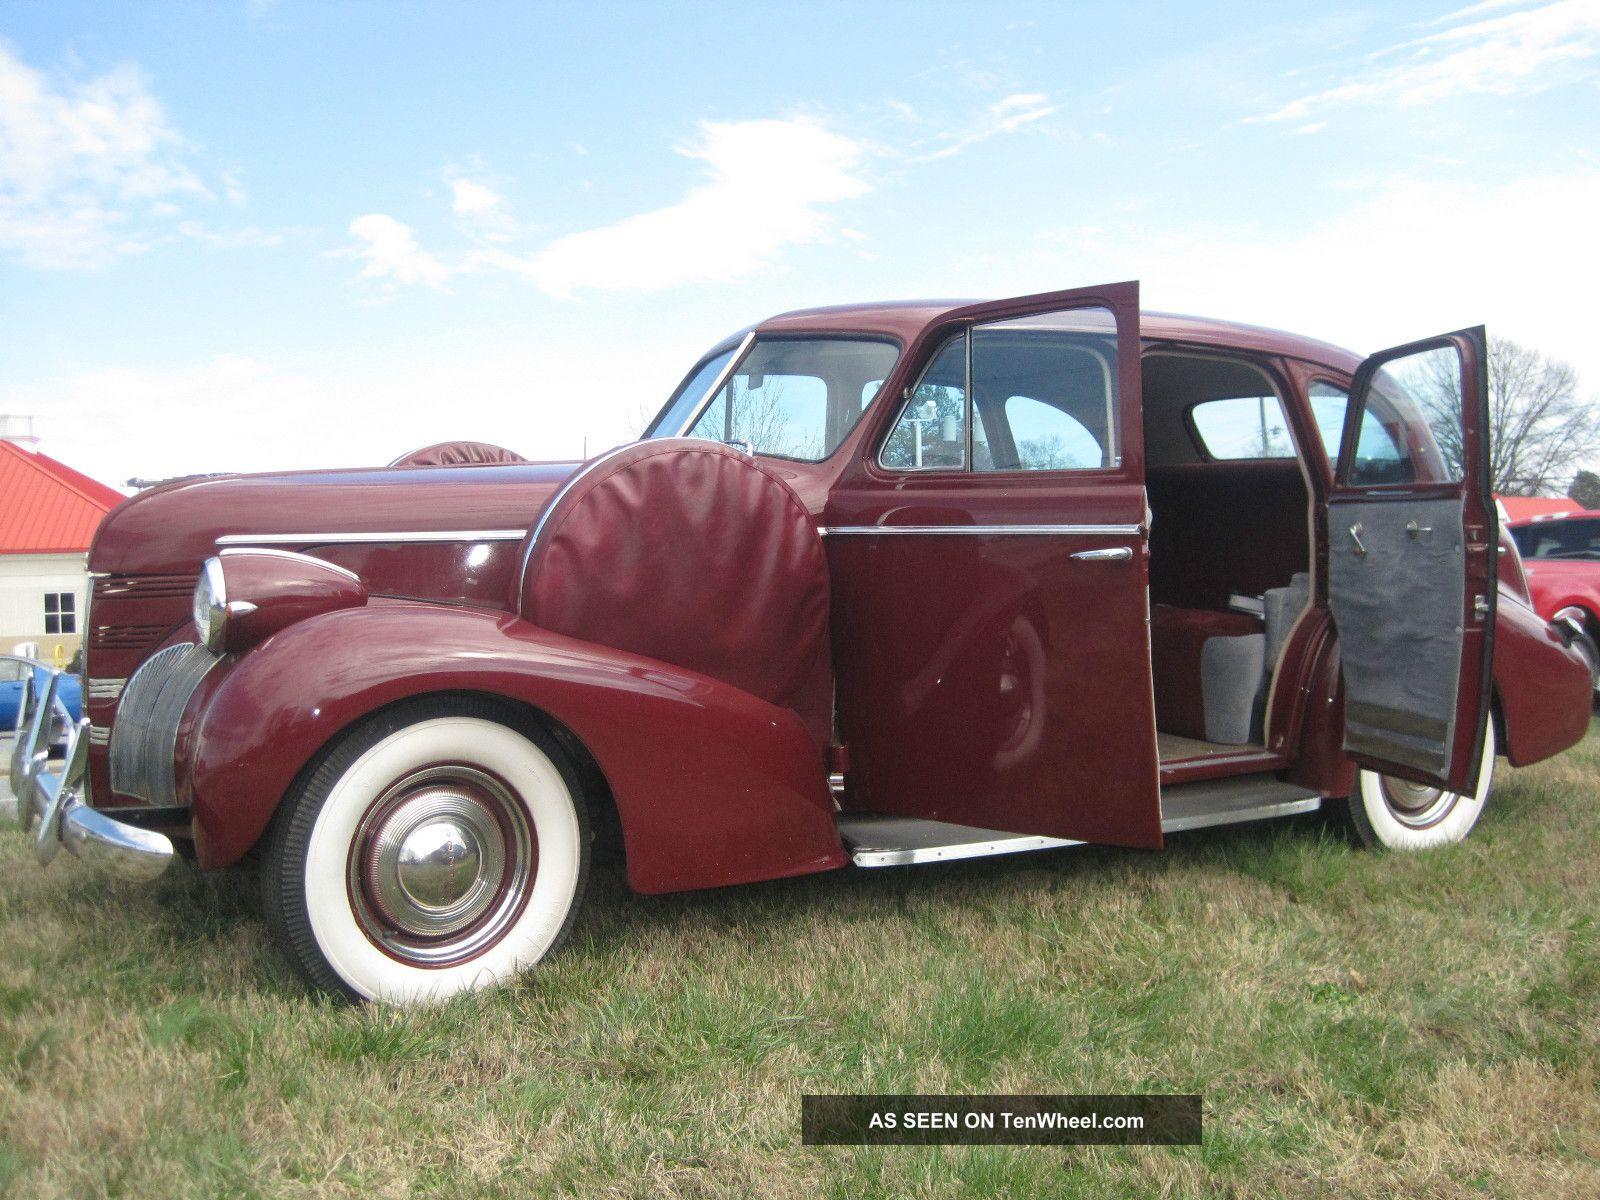 1939 Pontiac Deluxe 4 Door Touring Sedan P / S A / C Drives & Looks Excellent Other photo